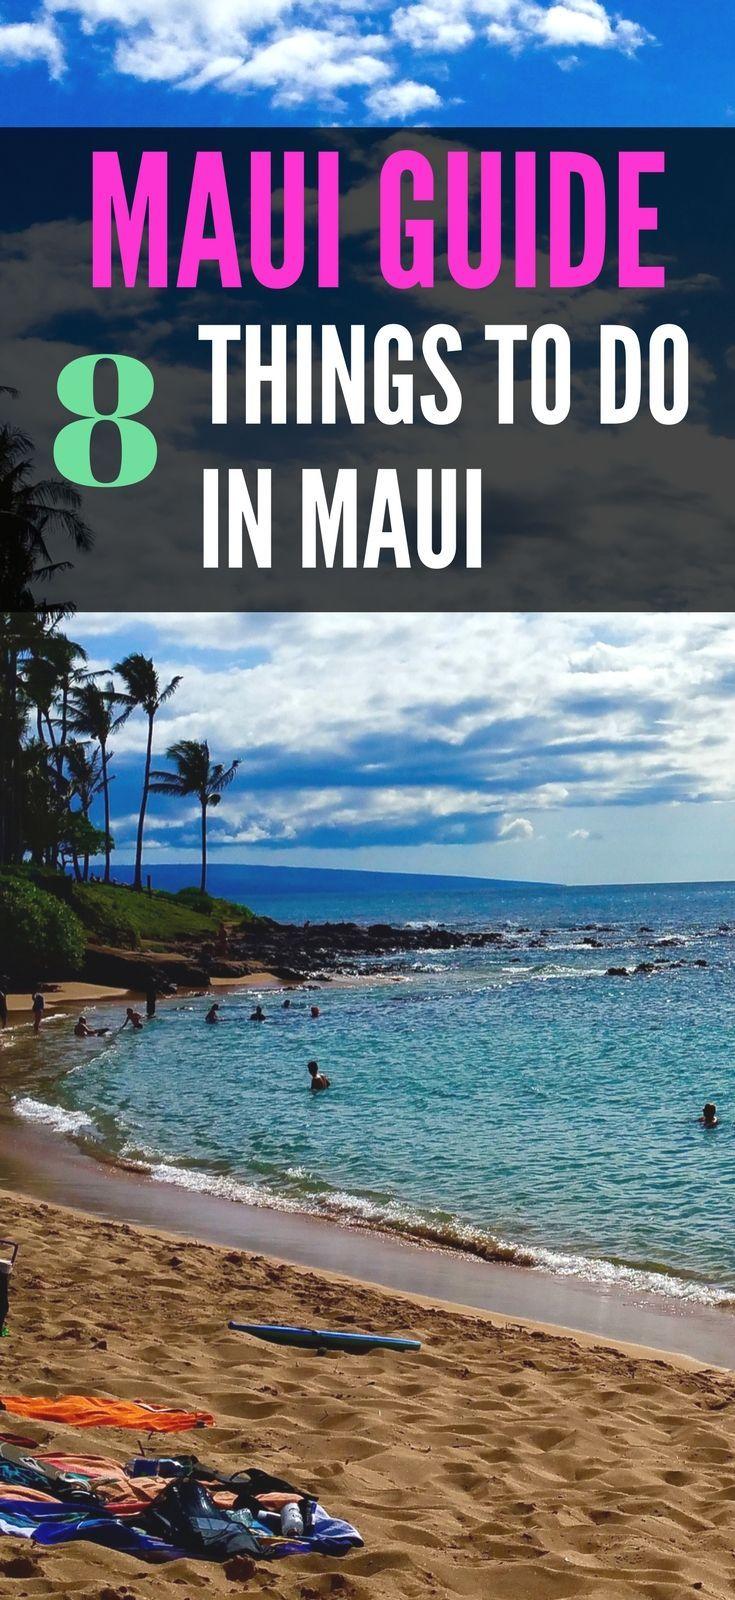 8 Awesome Things To Do In Maui Guide To Maui Maui